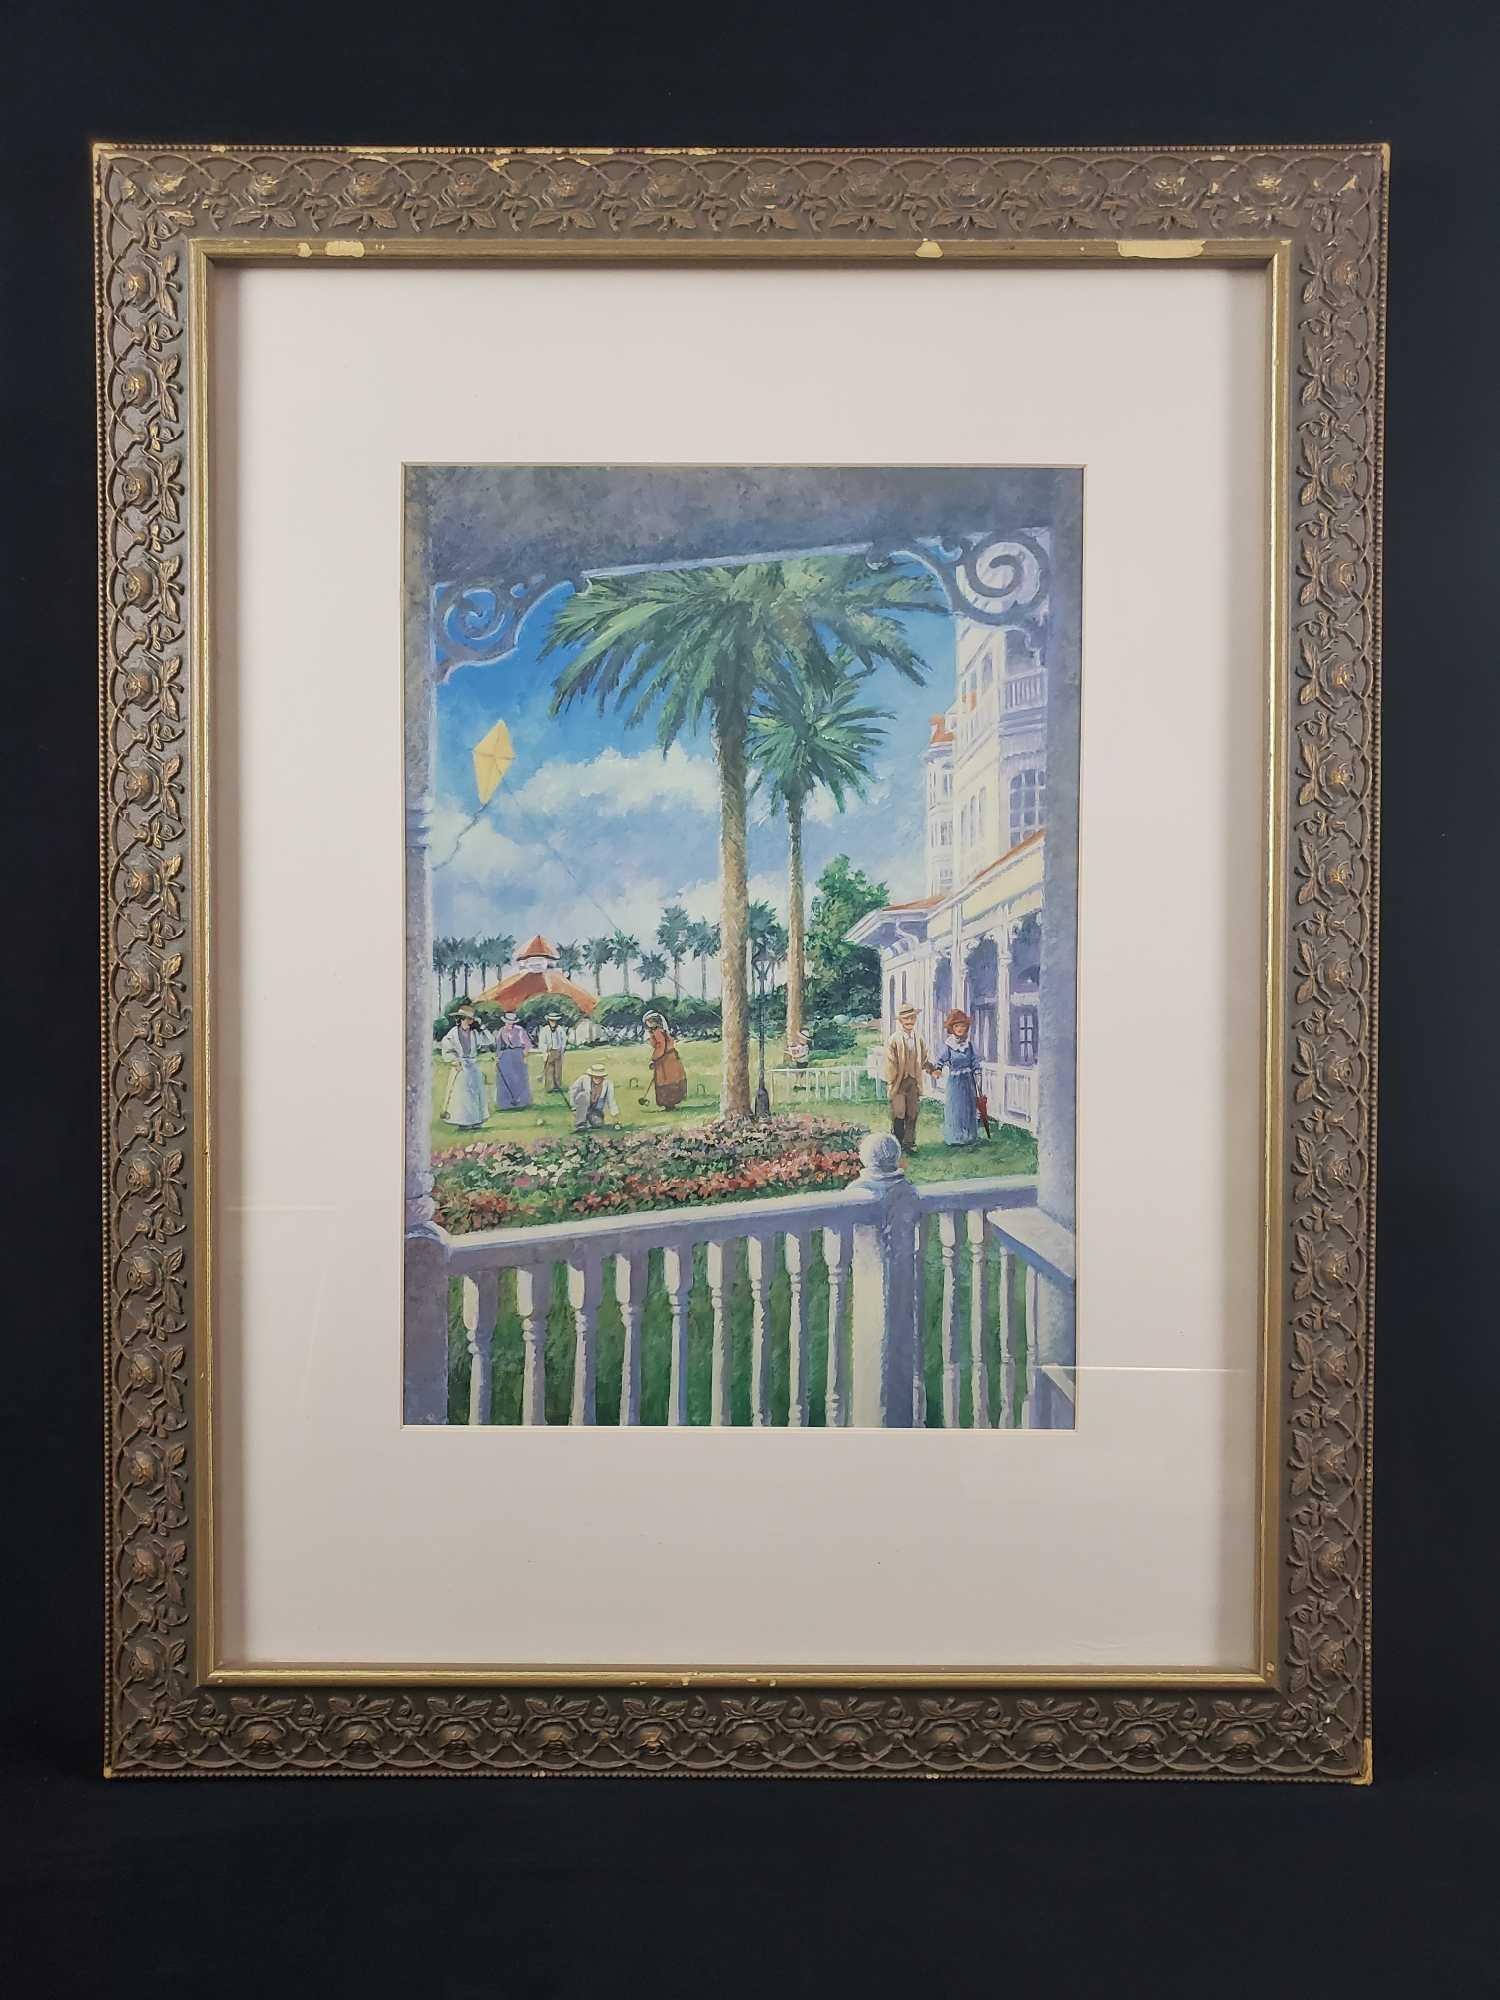 Framed Art Disney Grand Floridian Hotel A